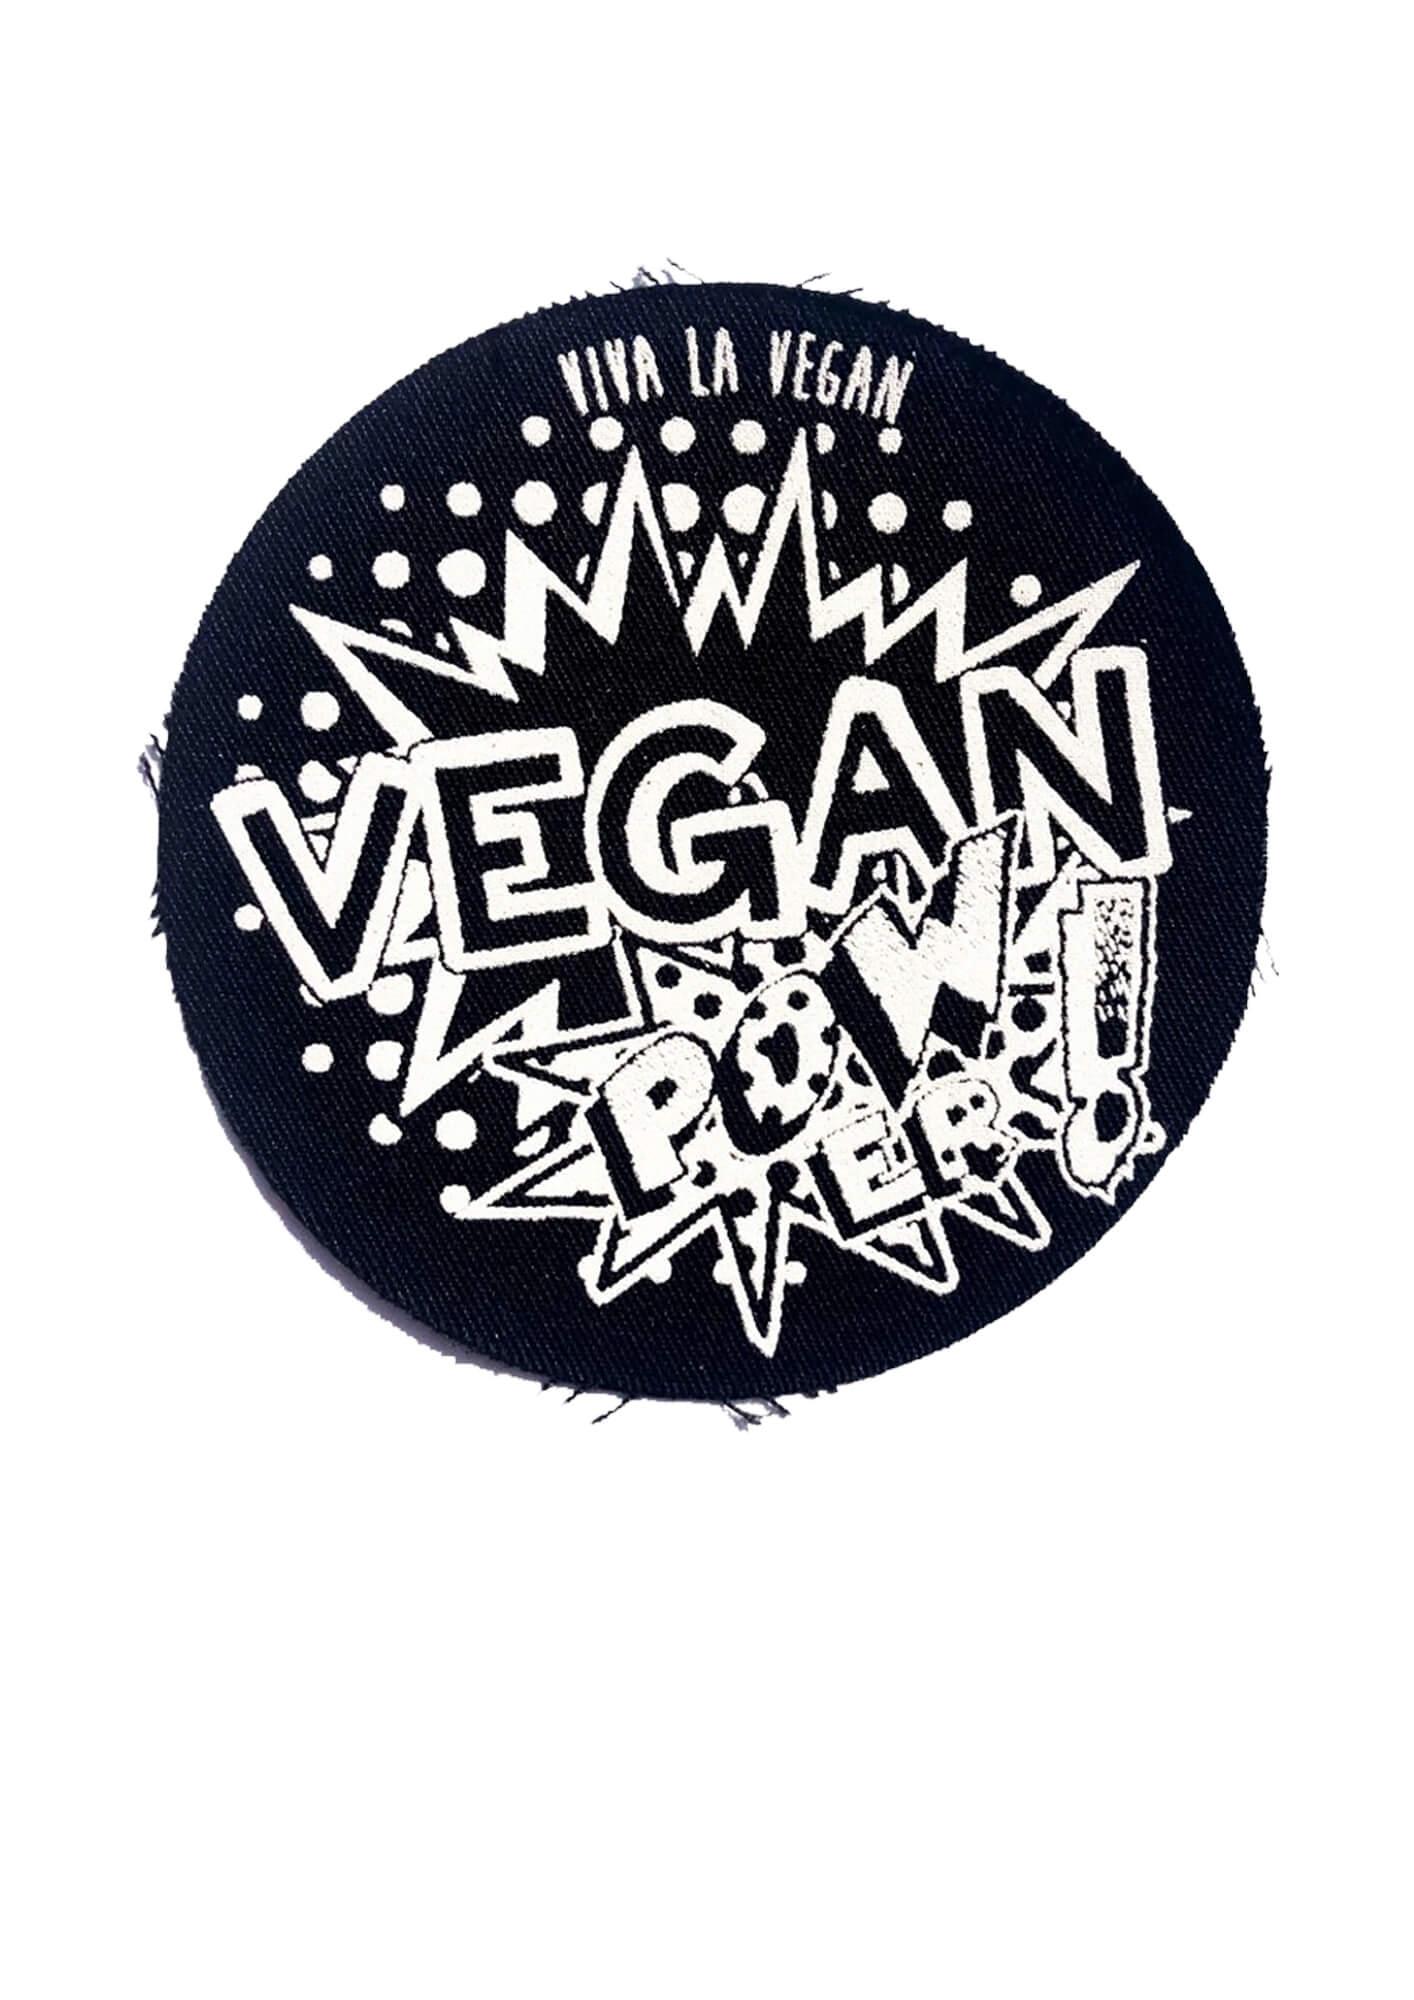 Printed Patch Round - Vegan POWer by eco ethical brand Viva La Vegan